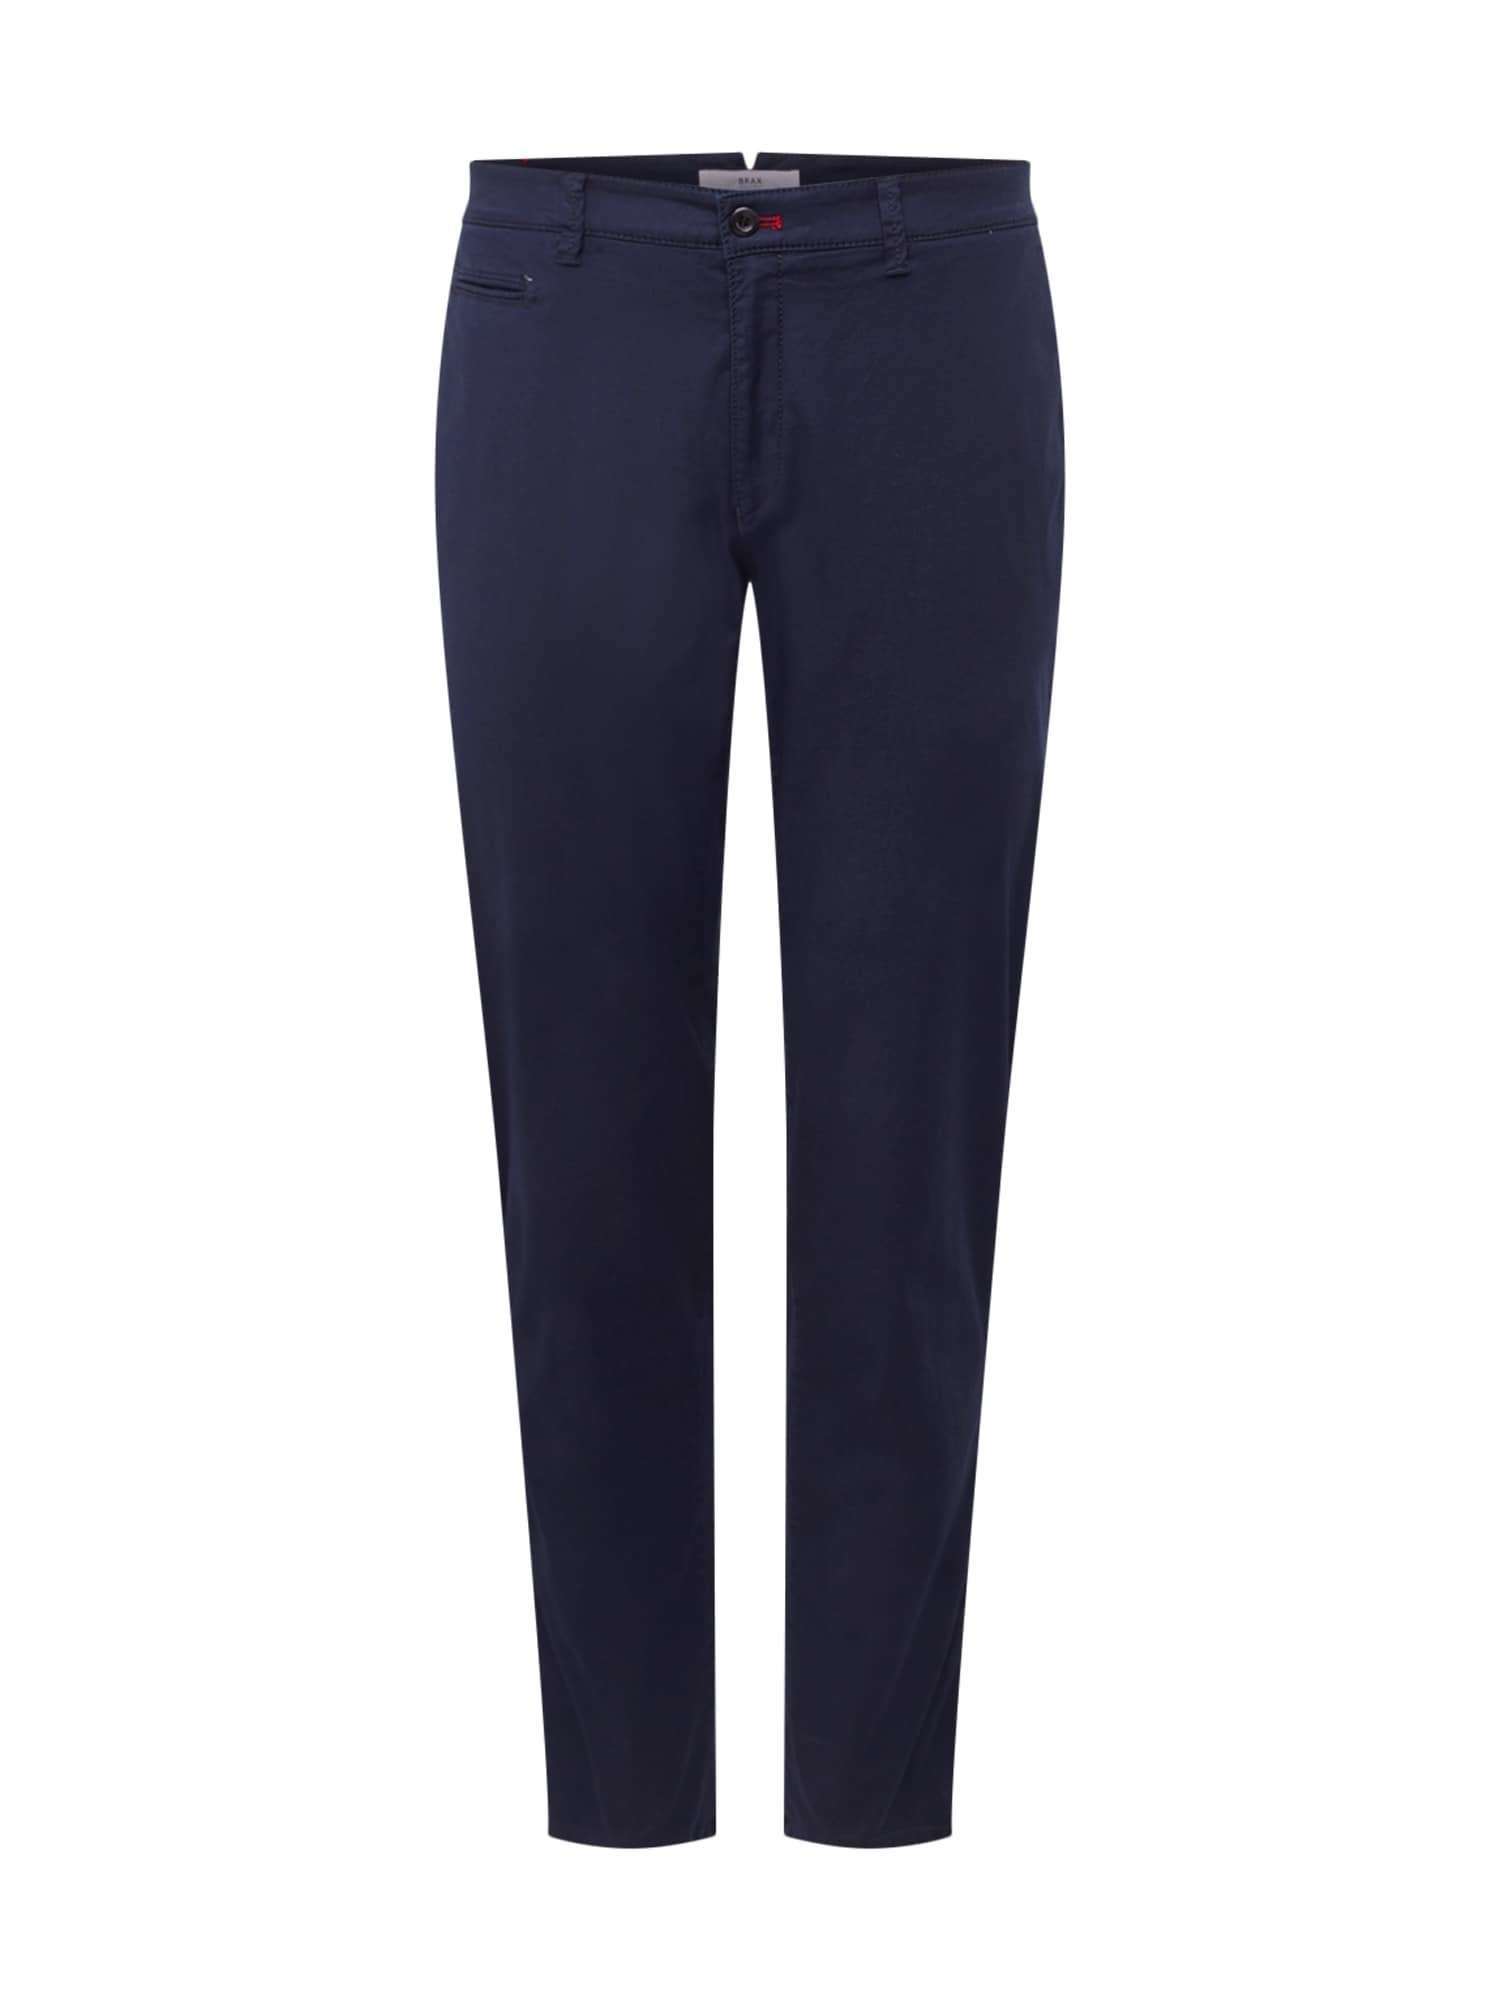 Chino kalhoty fabio in námořnická modř BRAX